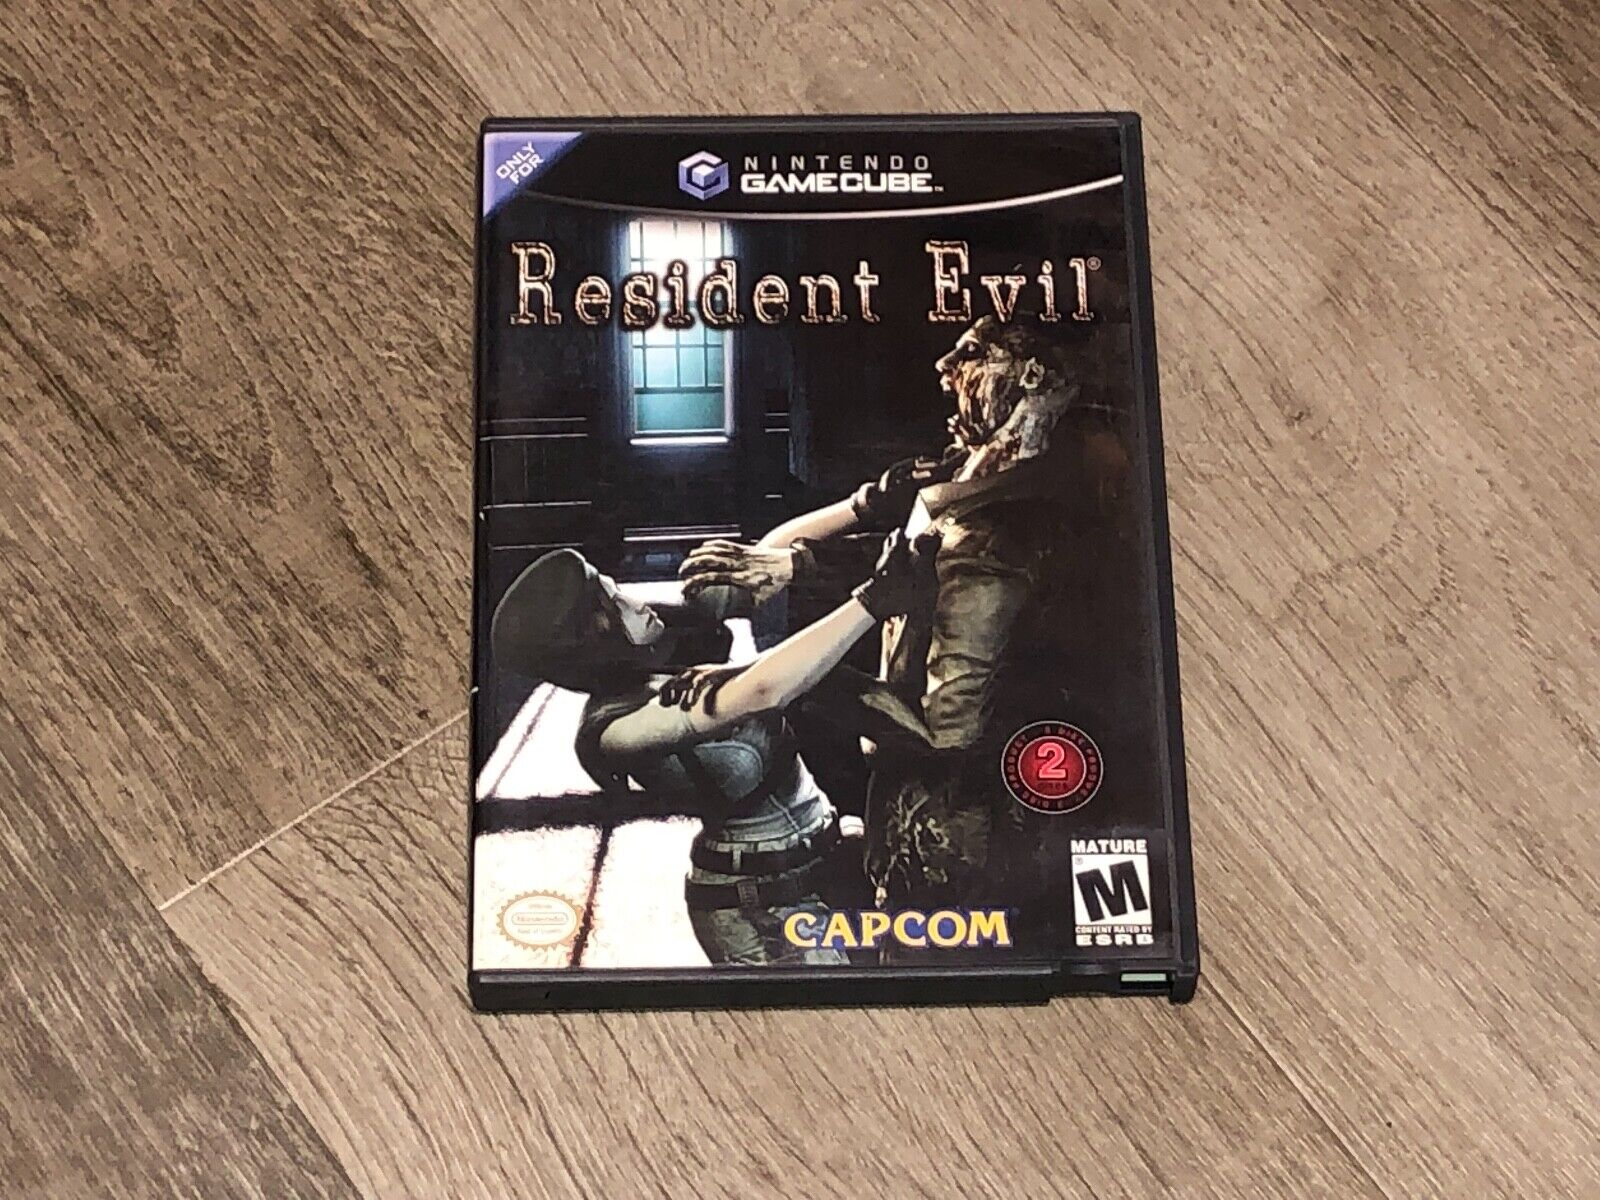 Resident Evil Nintendo Gamecube Wii Complete CIB